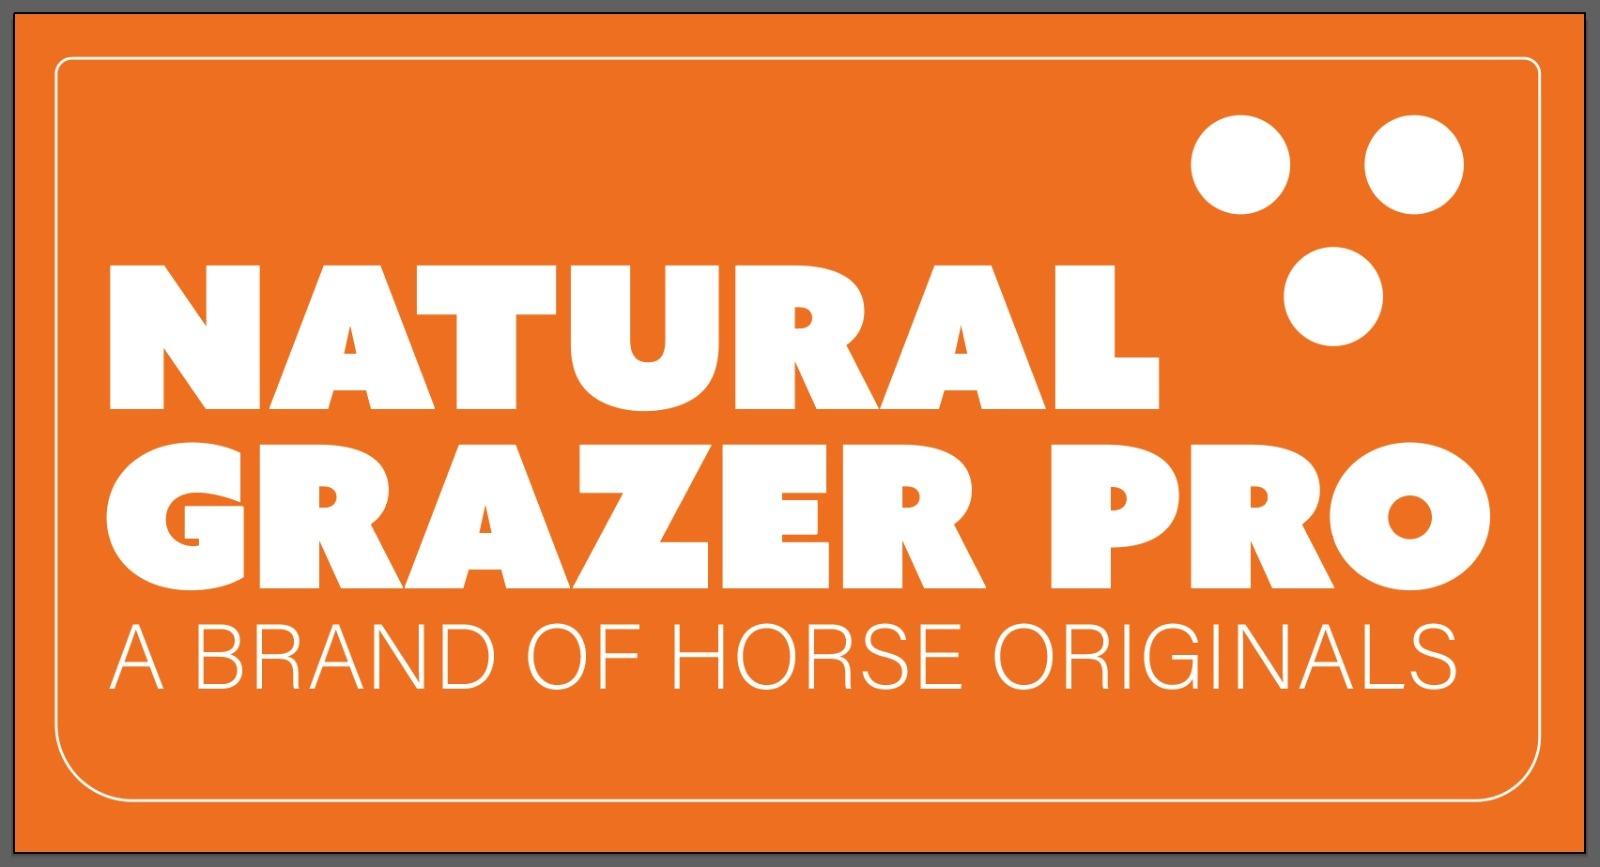 Natural Grazer Pro